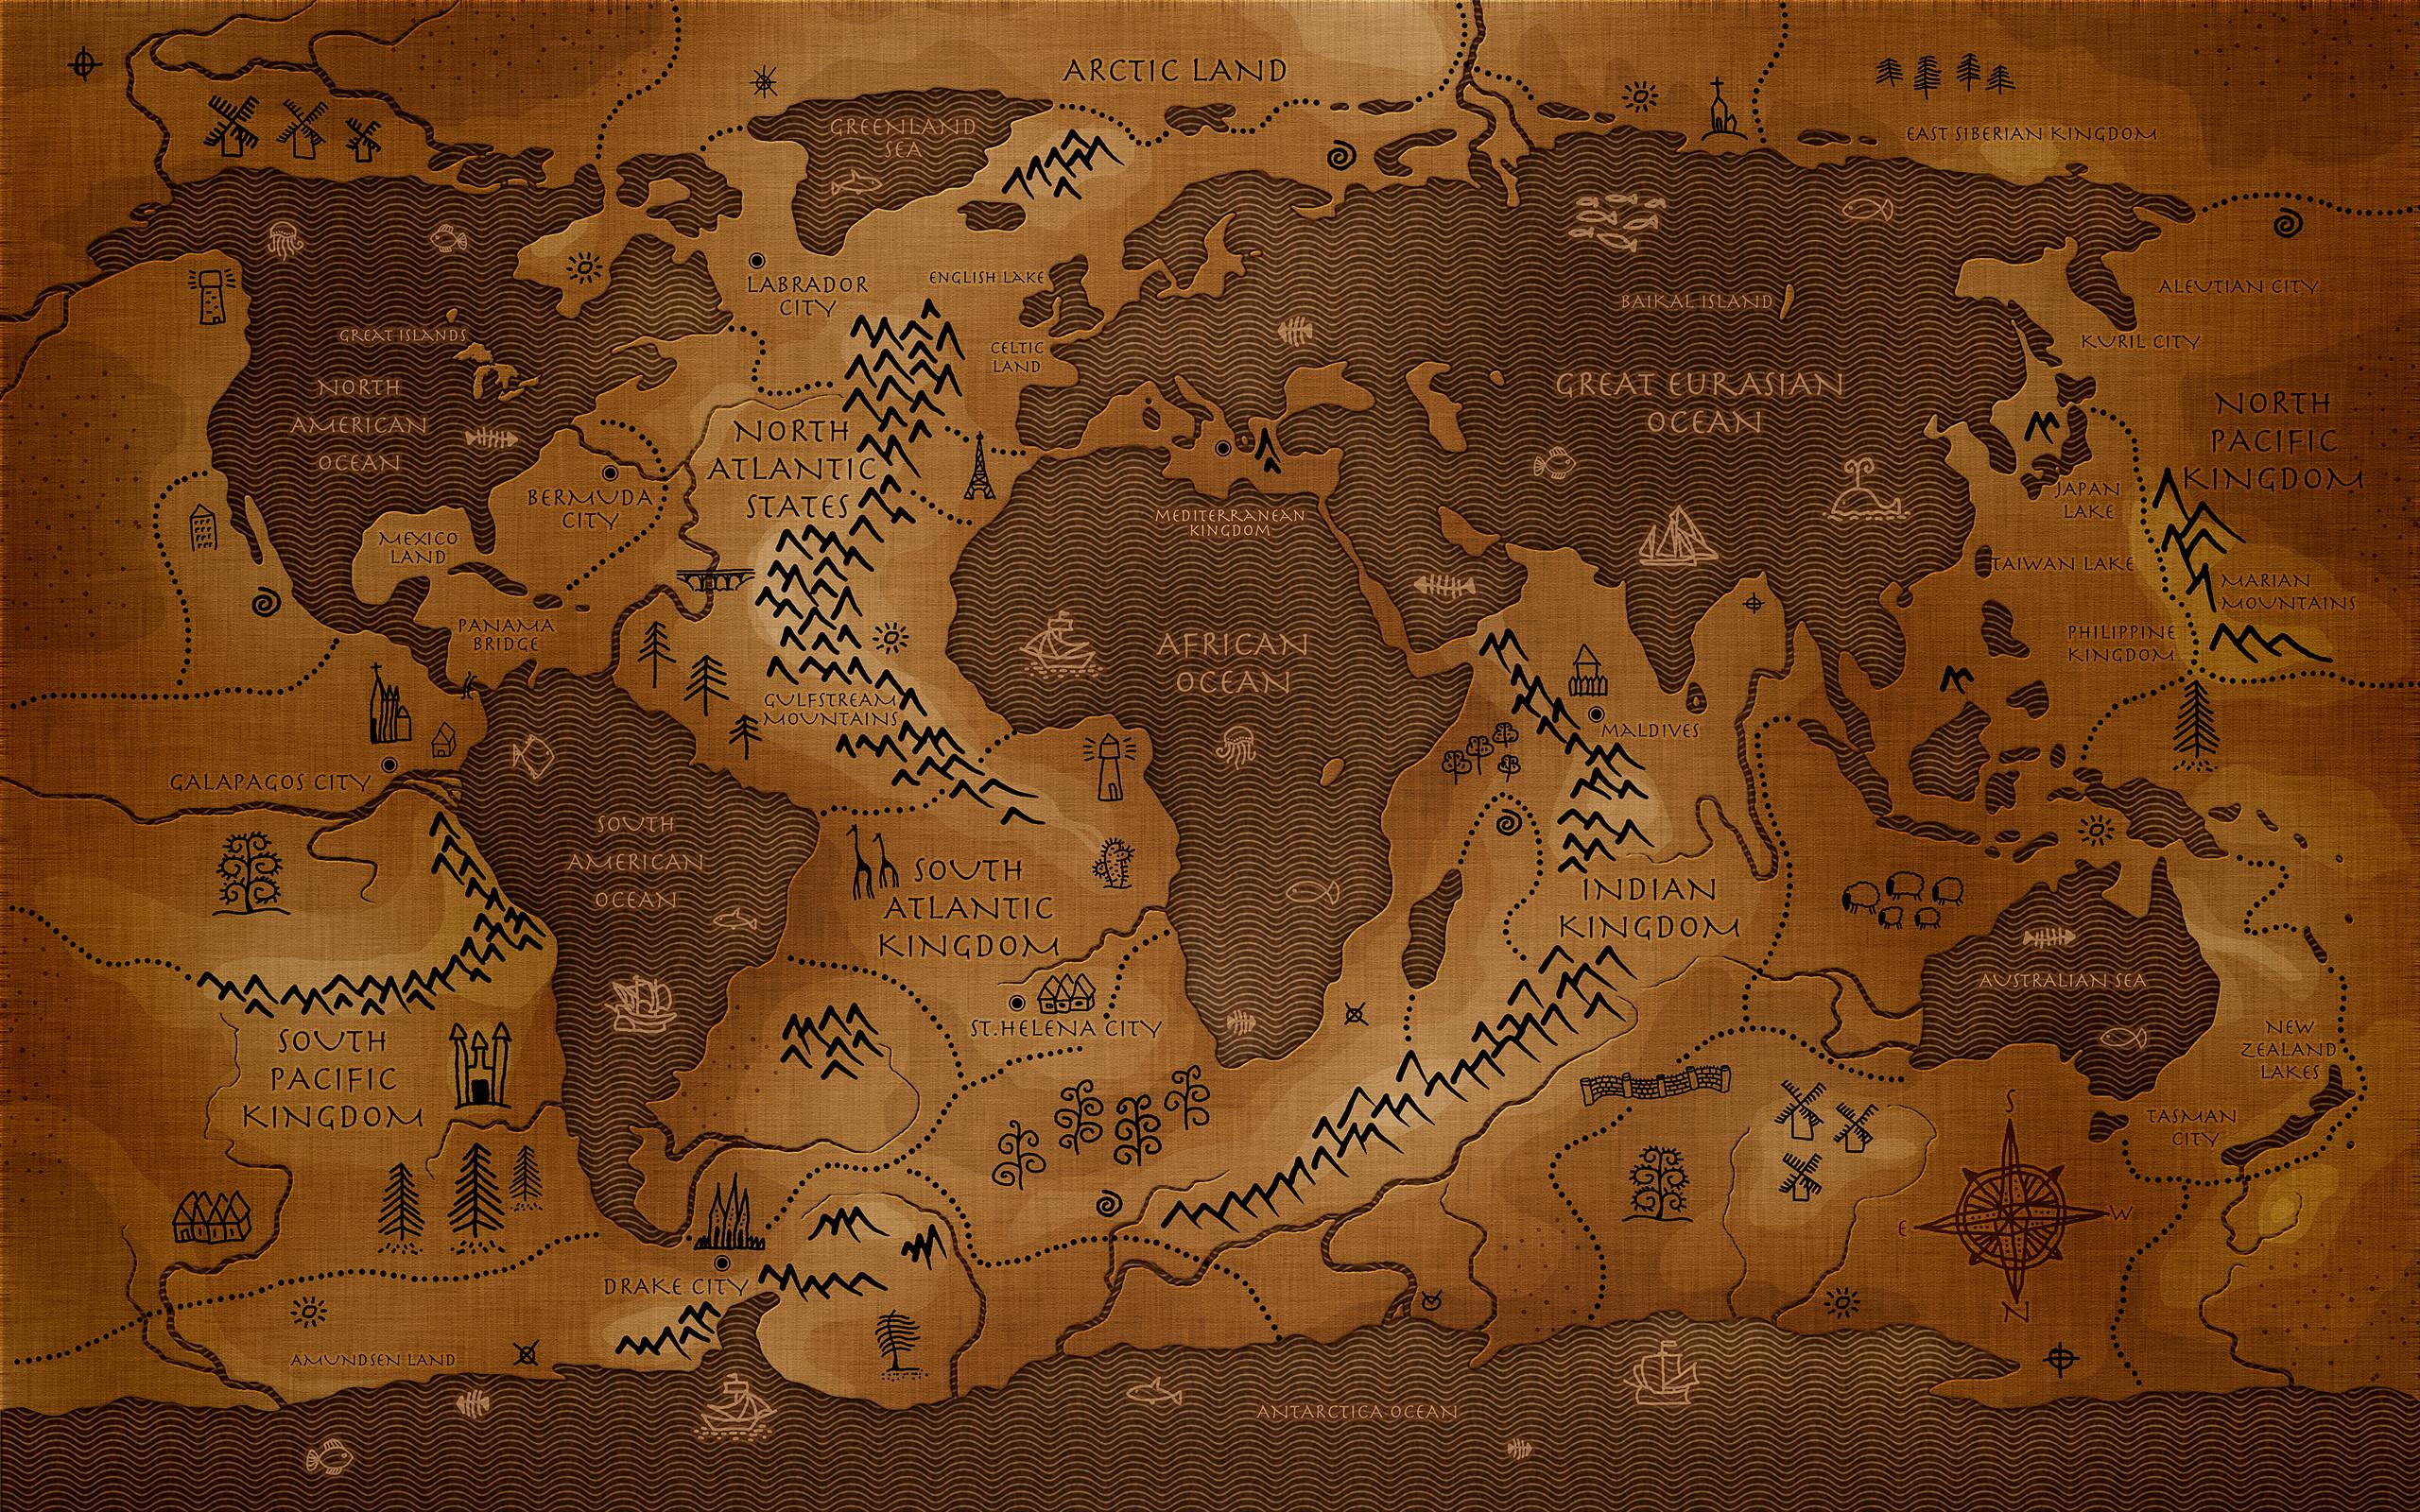 World map desktop wallpaper 54 images 1920x1080 1920x1080 1920x1080 cool world map desktop wallpaper free download wide wallpapers 1280x8001440x9001680x1050 gumiabroncs Images